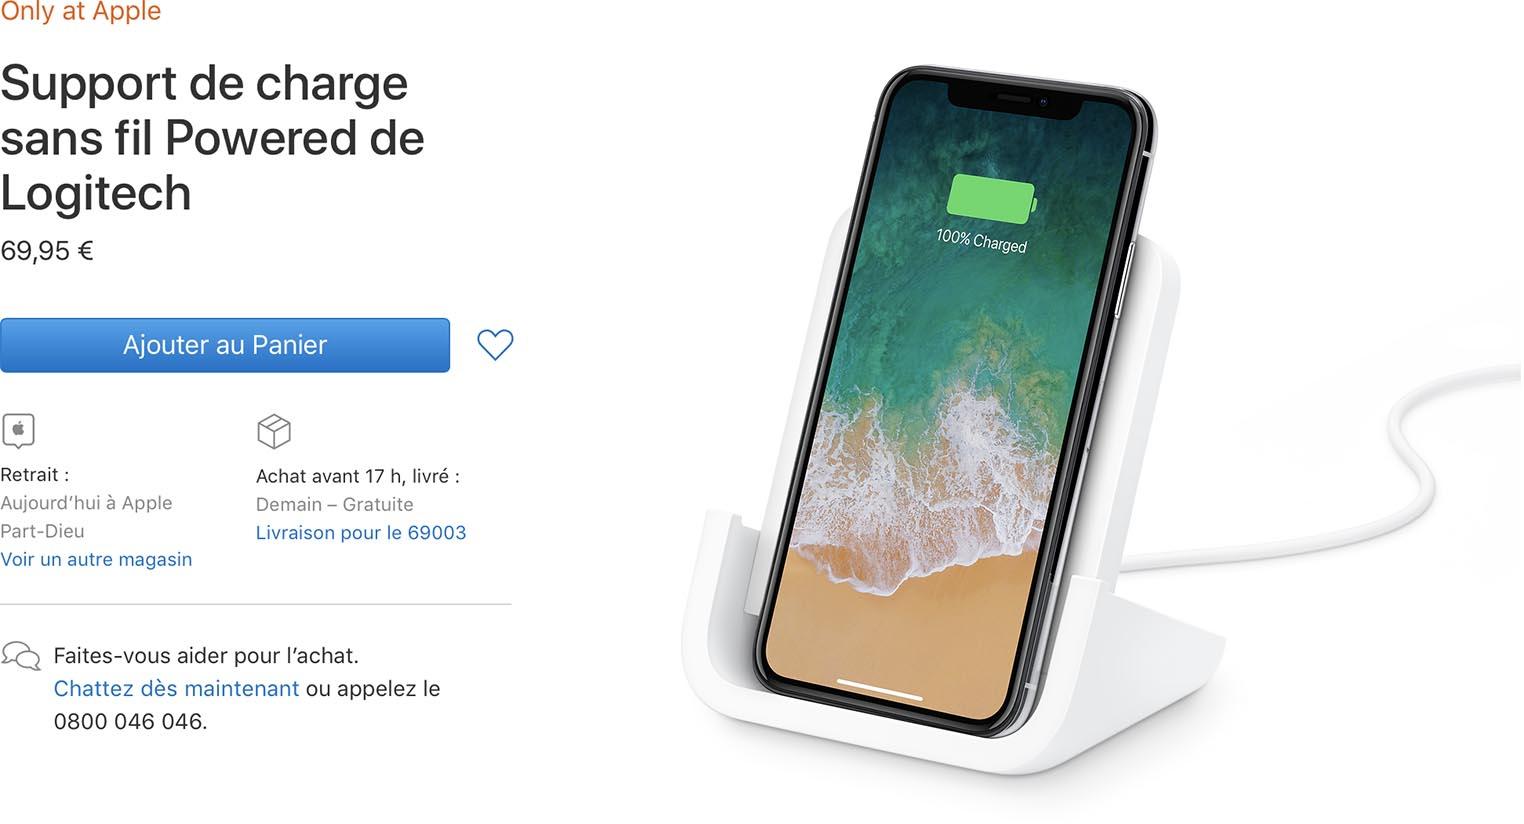 Powered Logitech Apple Store